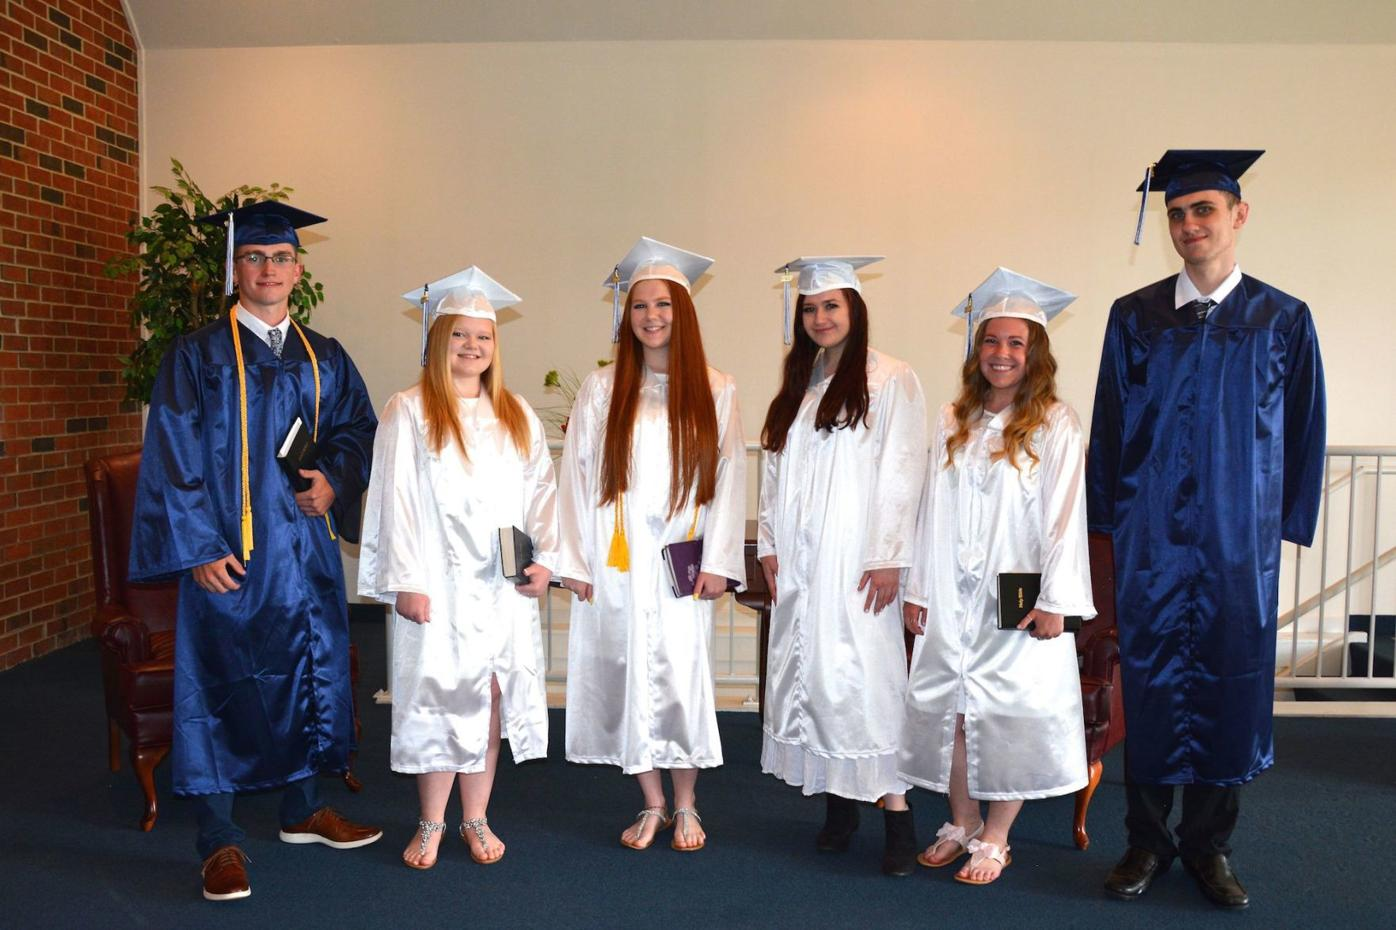 CCA graduates to begin a 'beautiful next chapter'